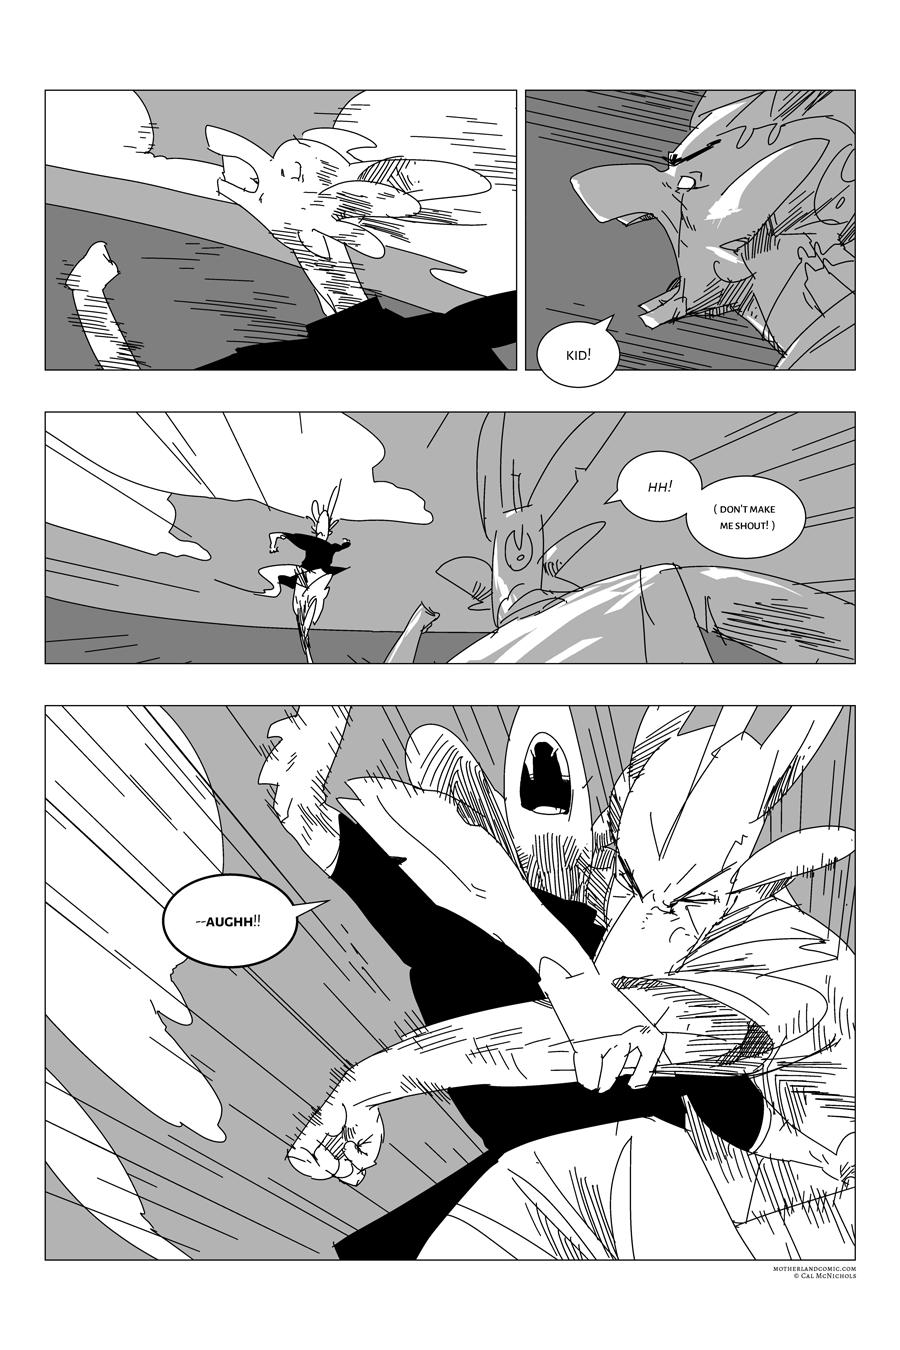 pg 99